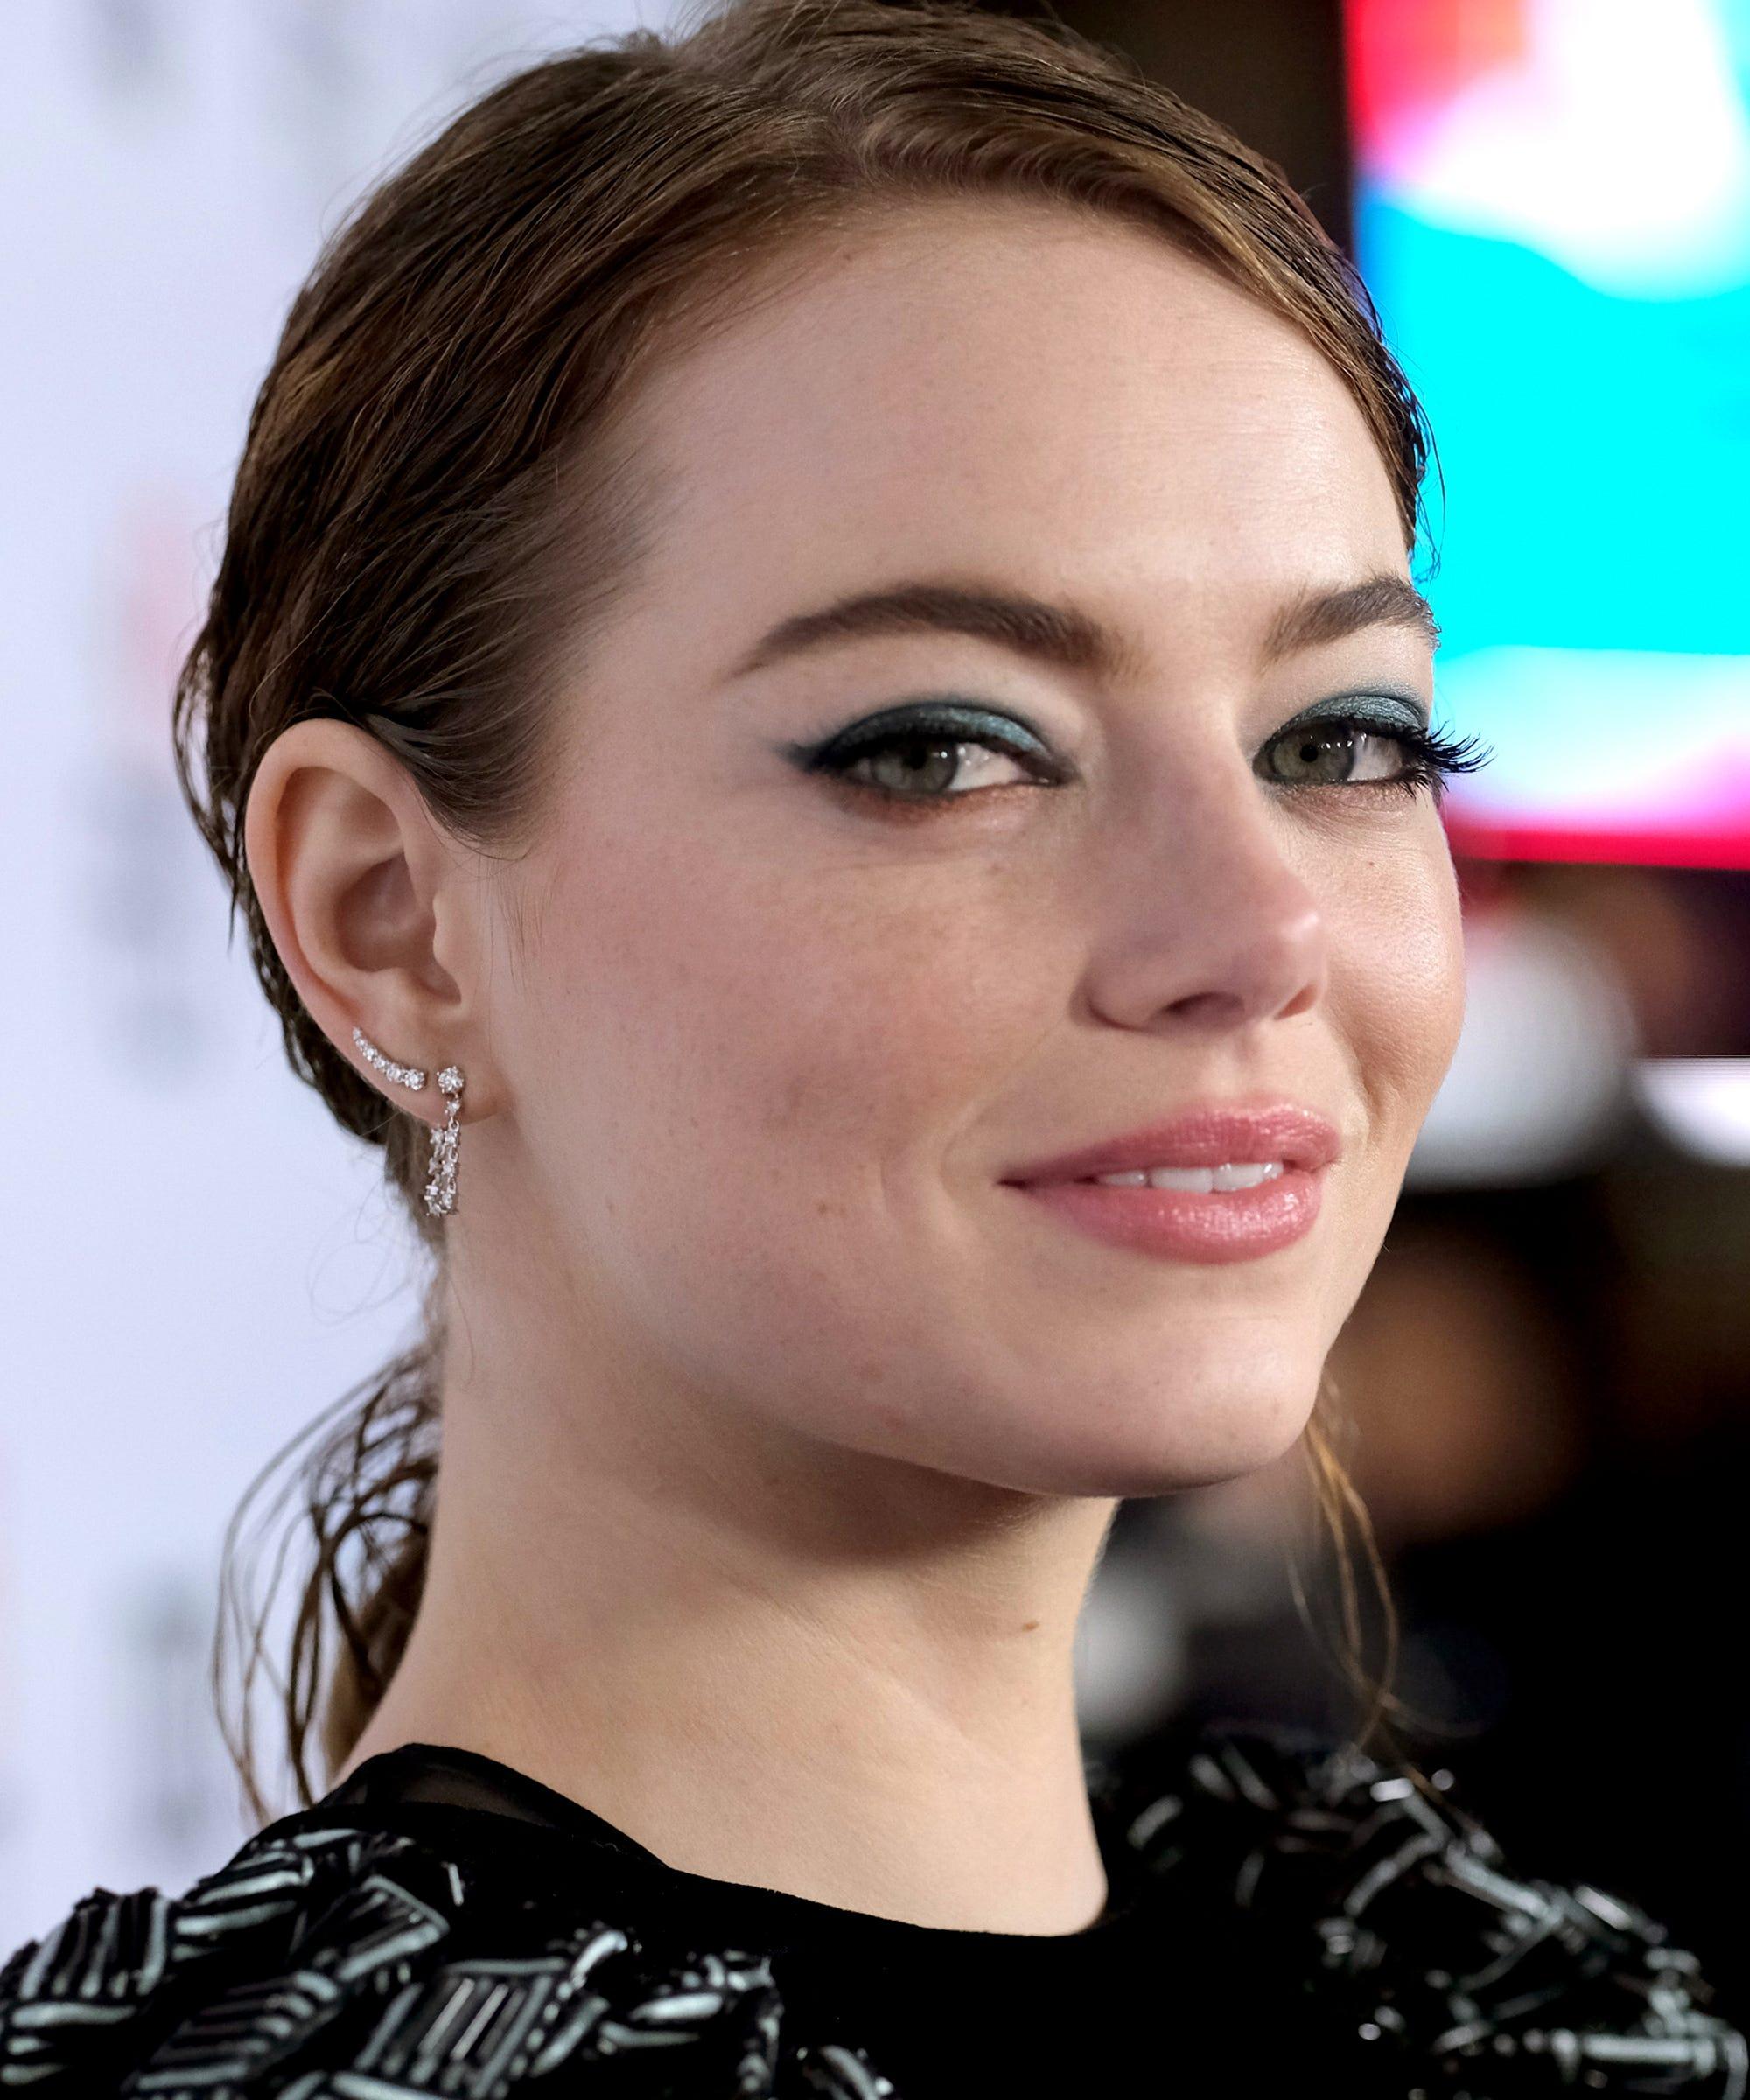 Emma Stone Hair Makeup Looks Updo Cat Eye Eyeliner